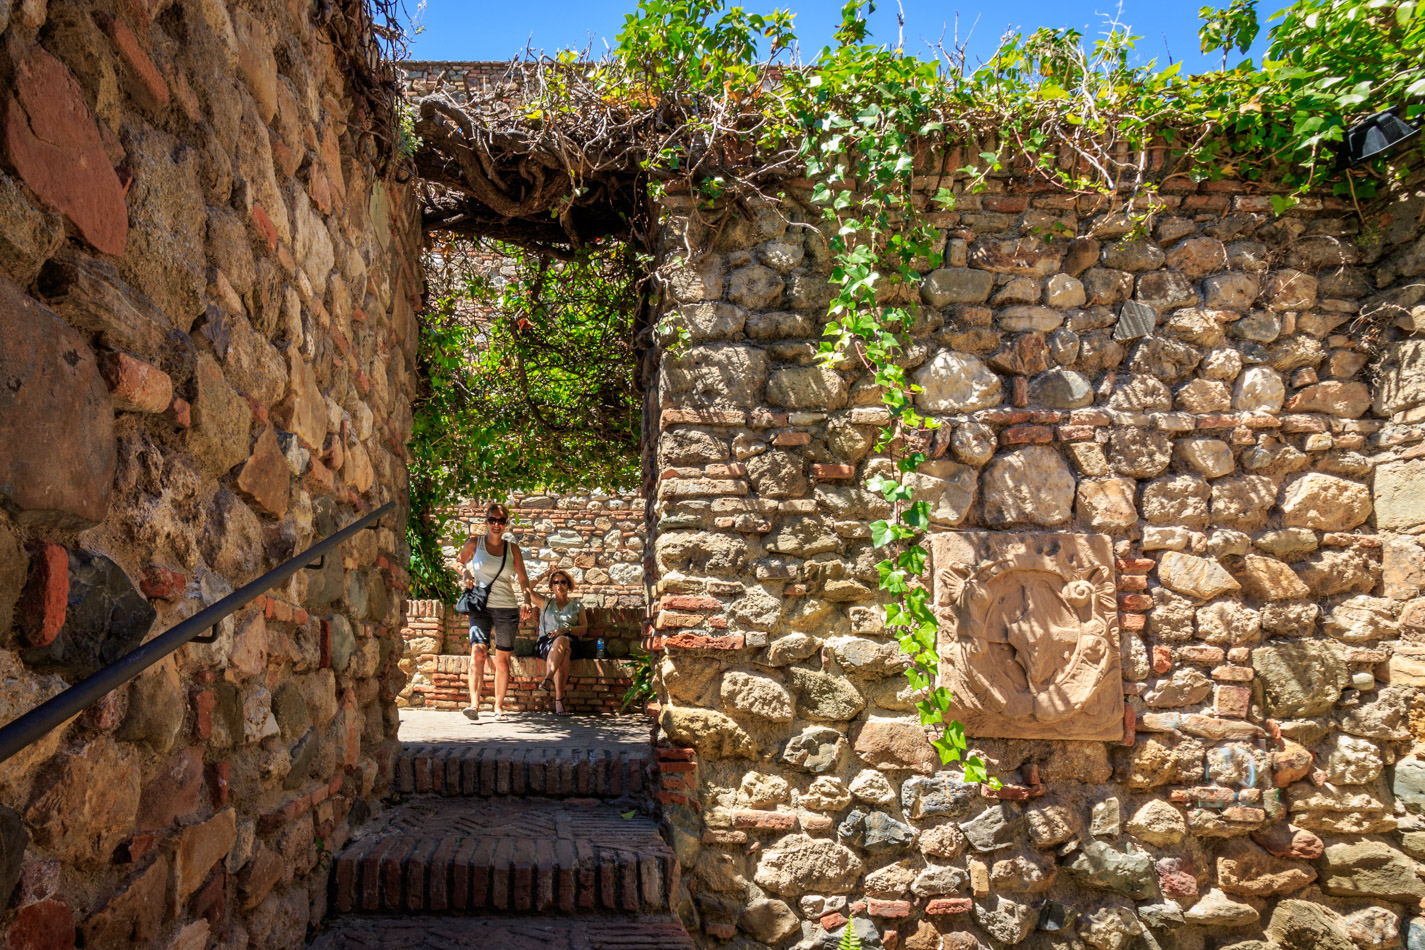 Alcazaba | Spanje, Málaga, 15 juni 2016